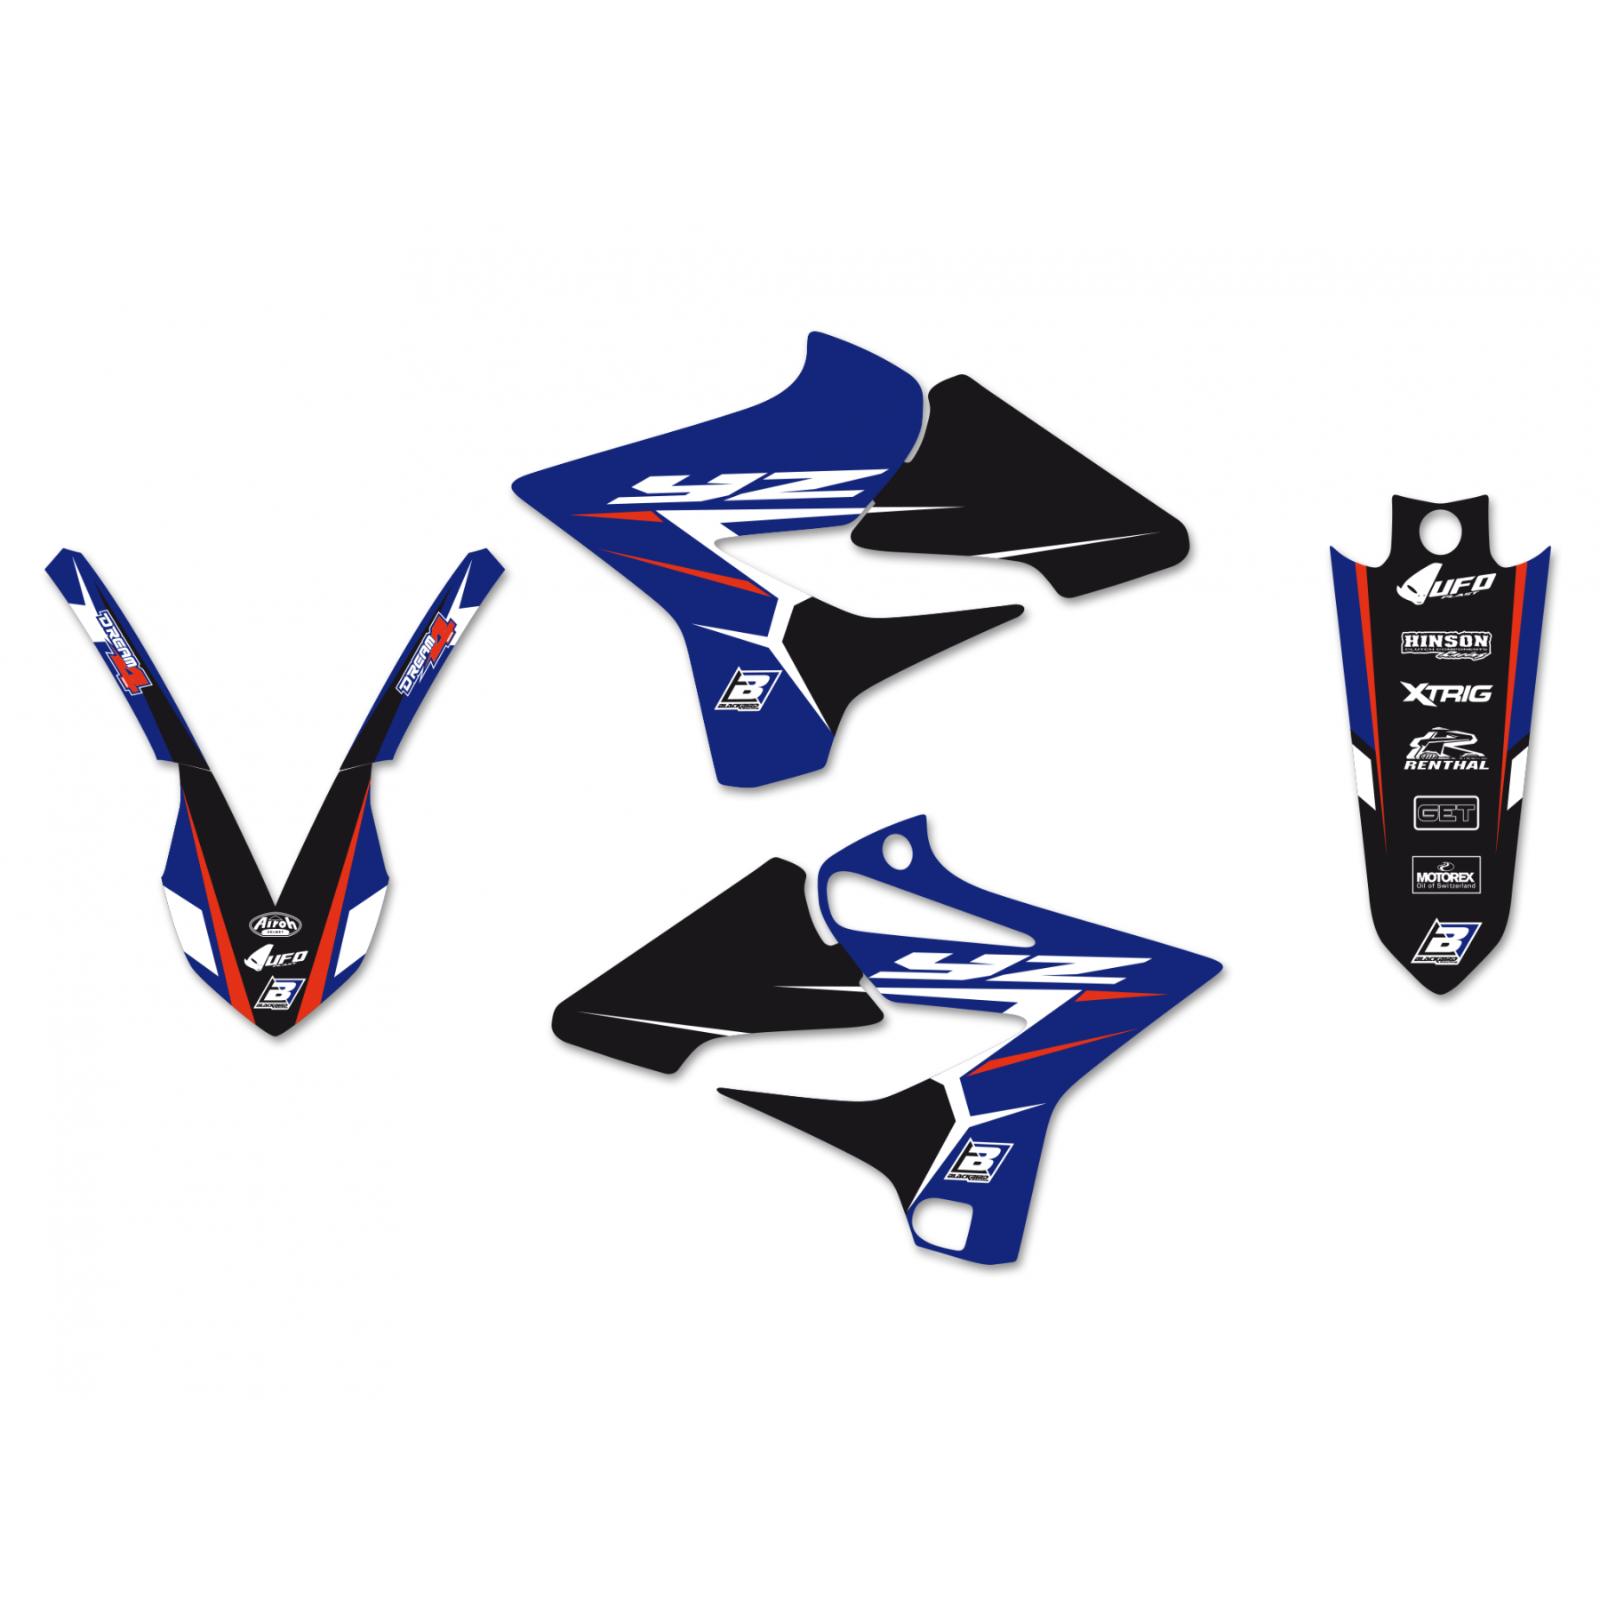 Kit adesivi moto grafiche Yamaha Yz 125 / 250 2015 2016 2017 2018 2019 2020 2021